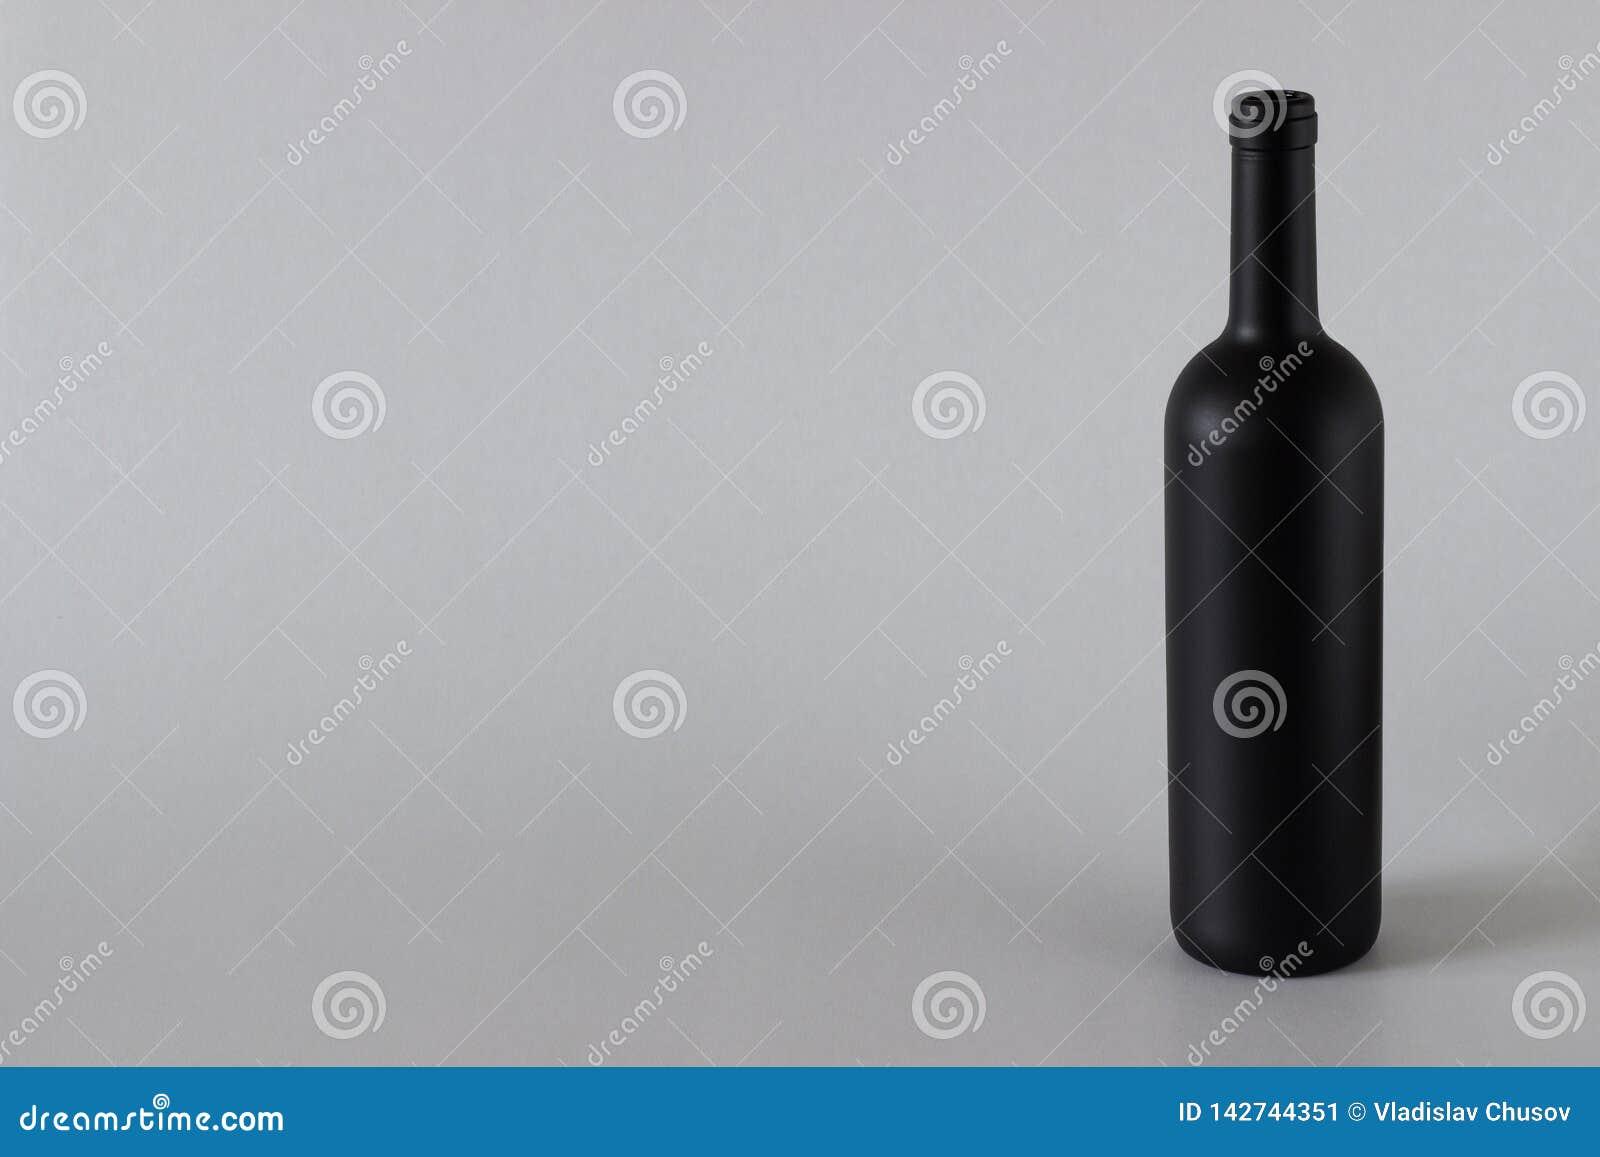 Wine bottle black on a white background.